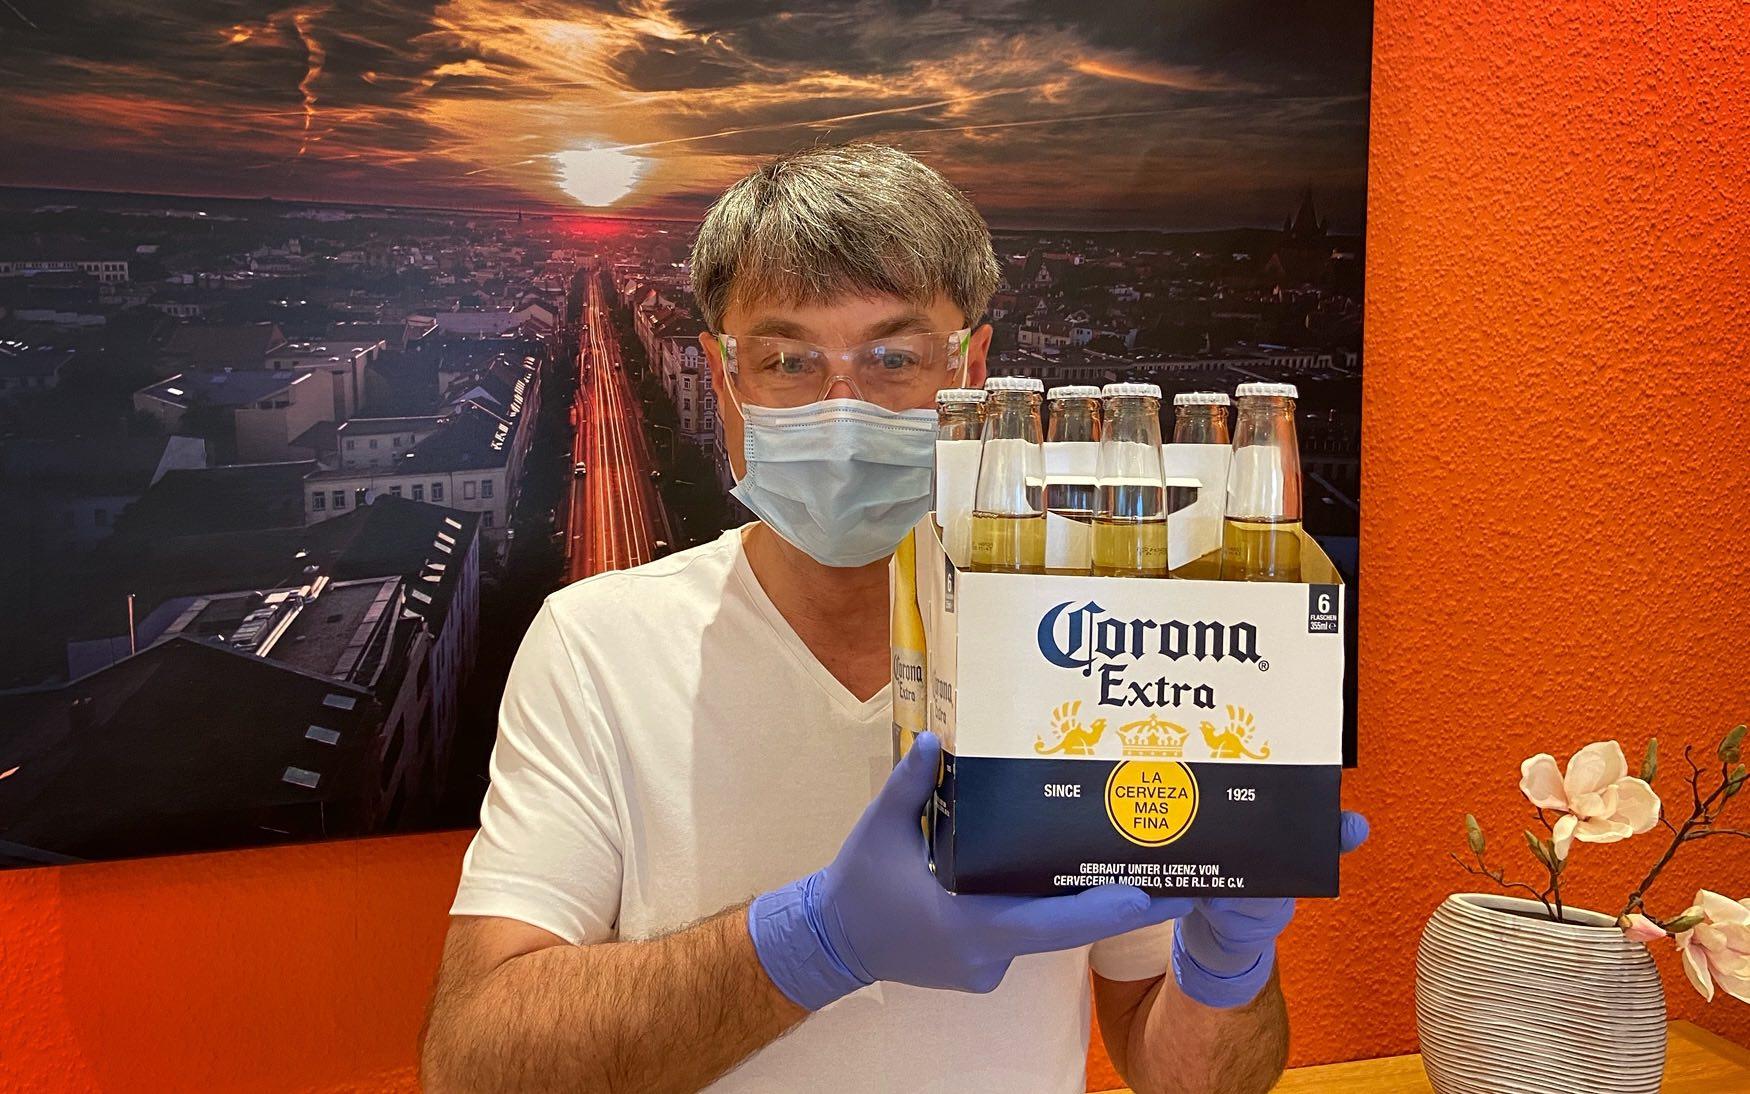 Corona Sixpack Zahnarzt Roger Barz Halle